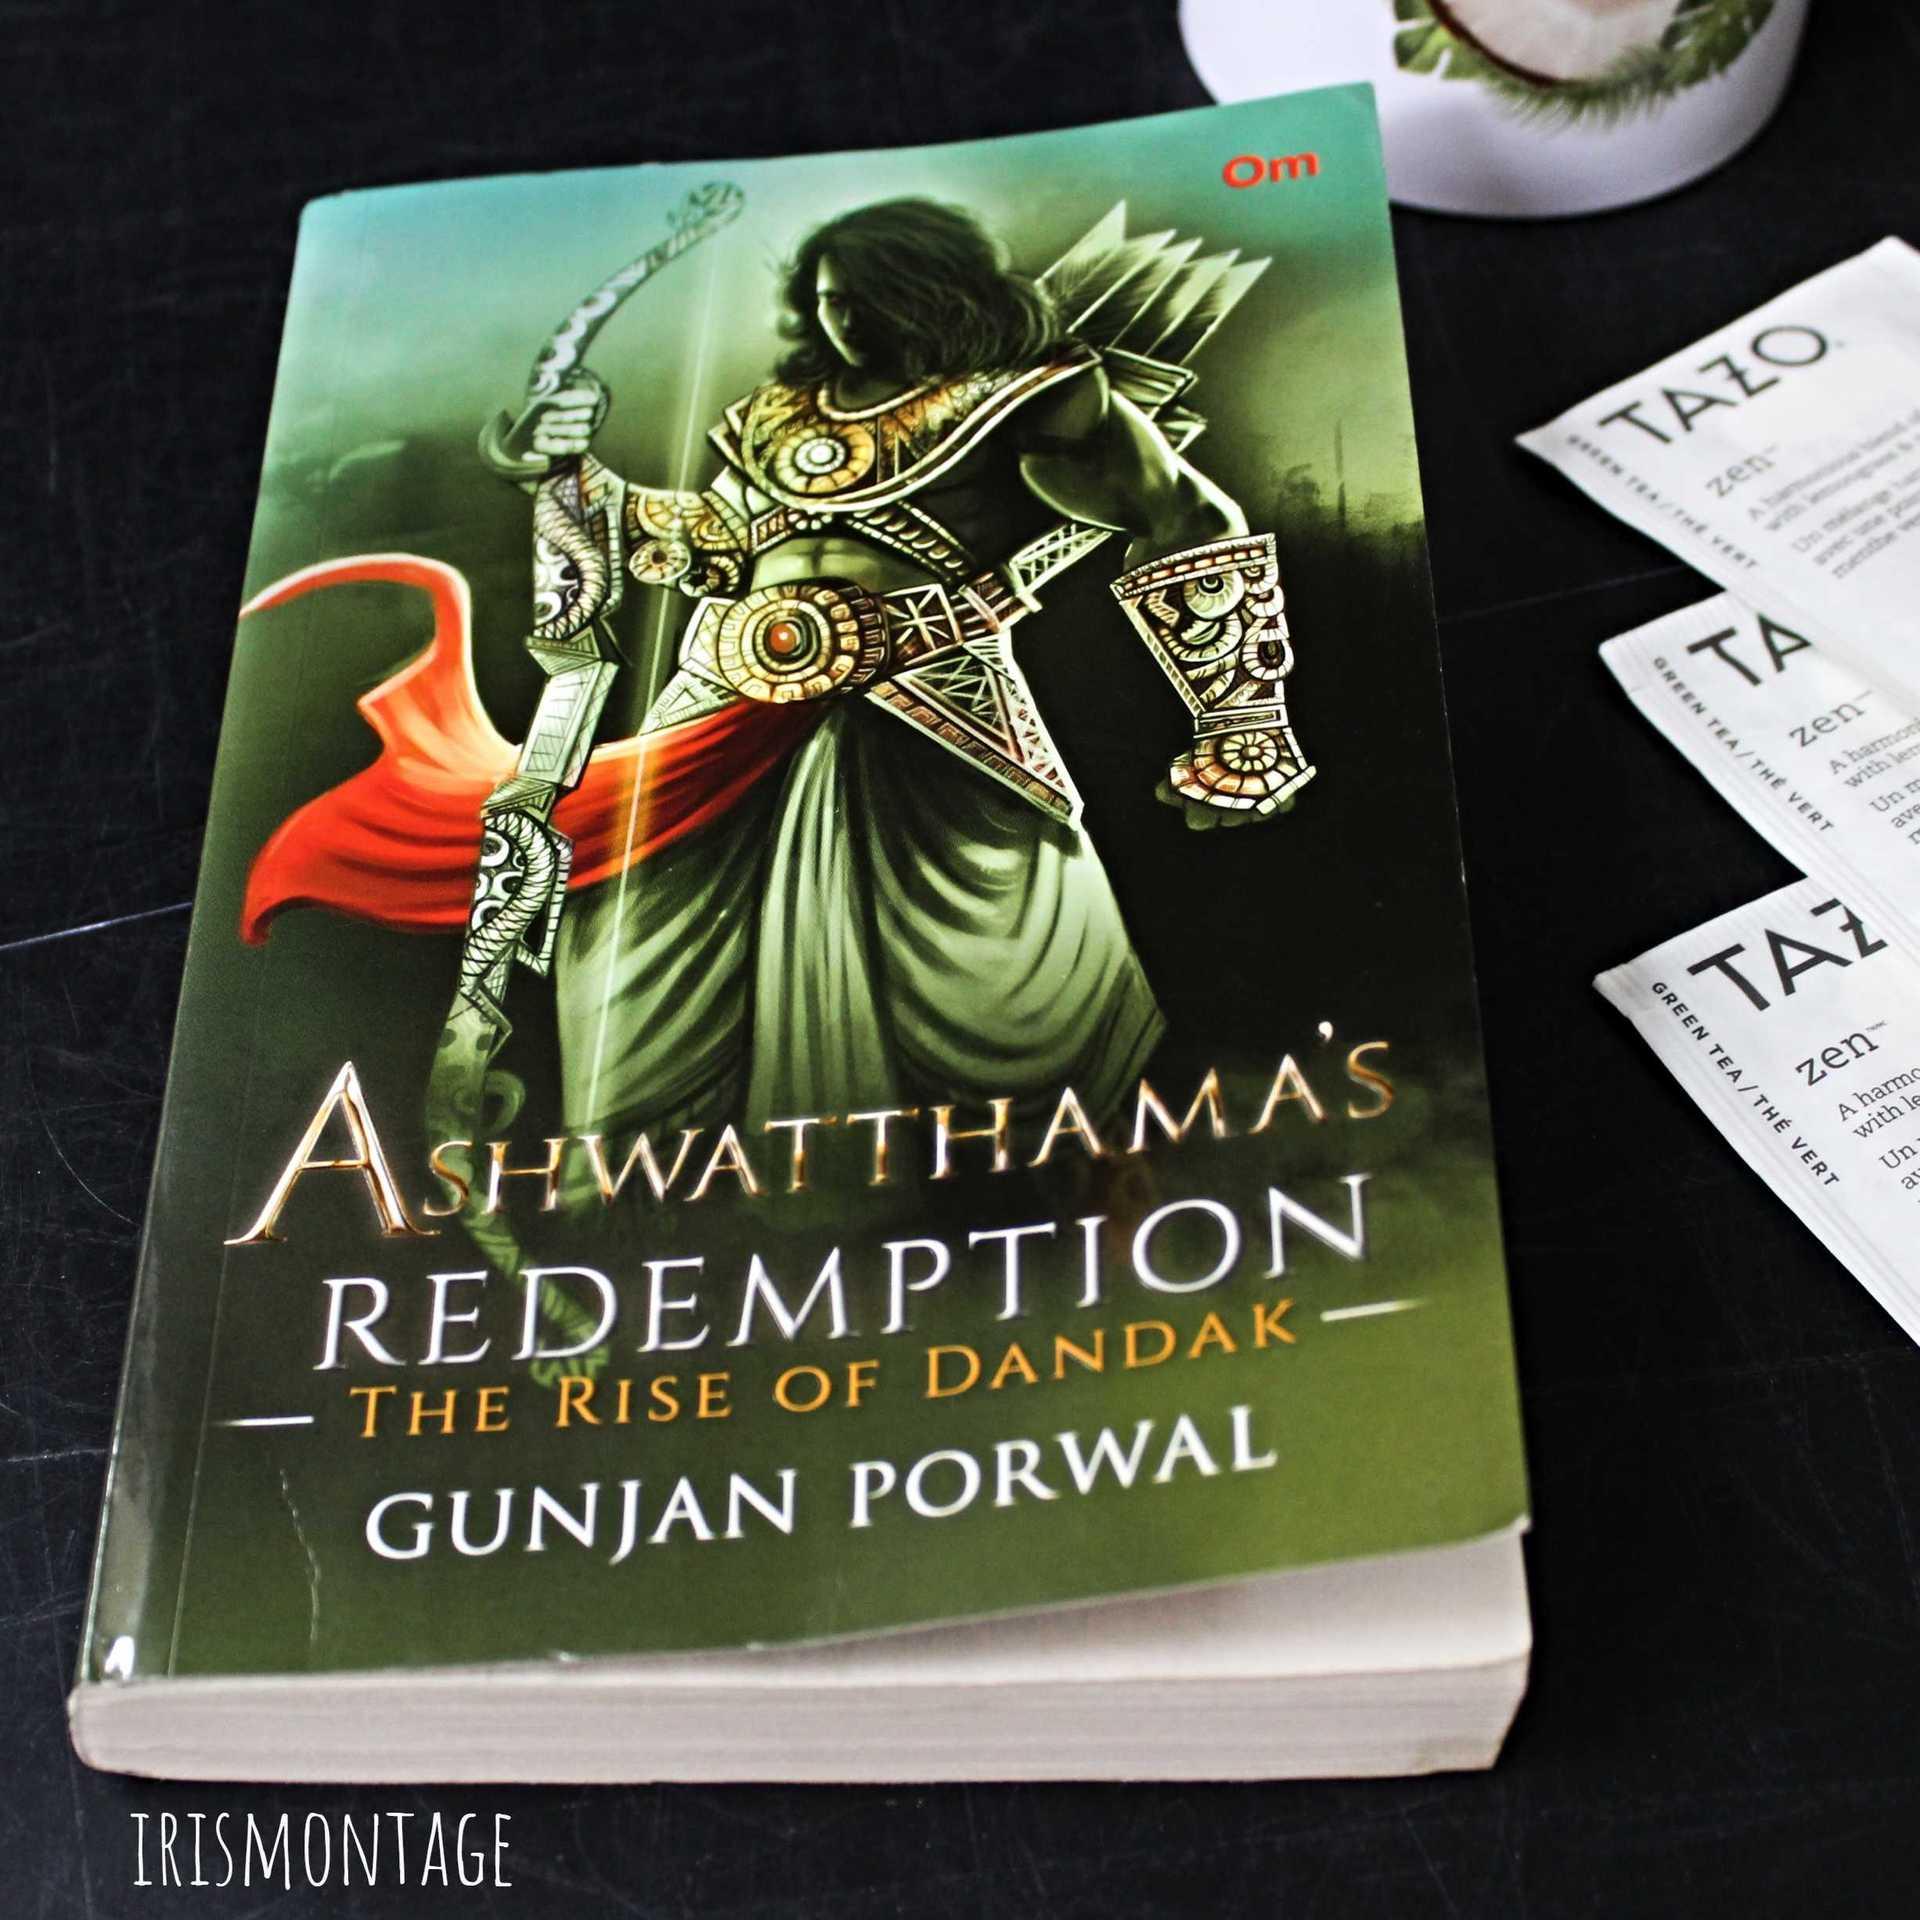 IrisMontage - ashwatthama's redemption rise of dandak